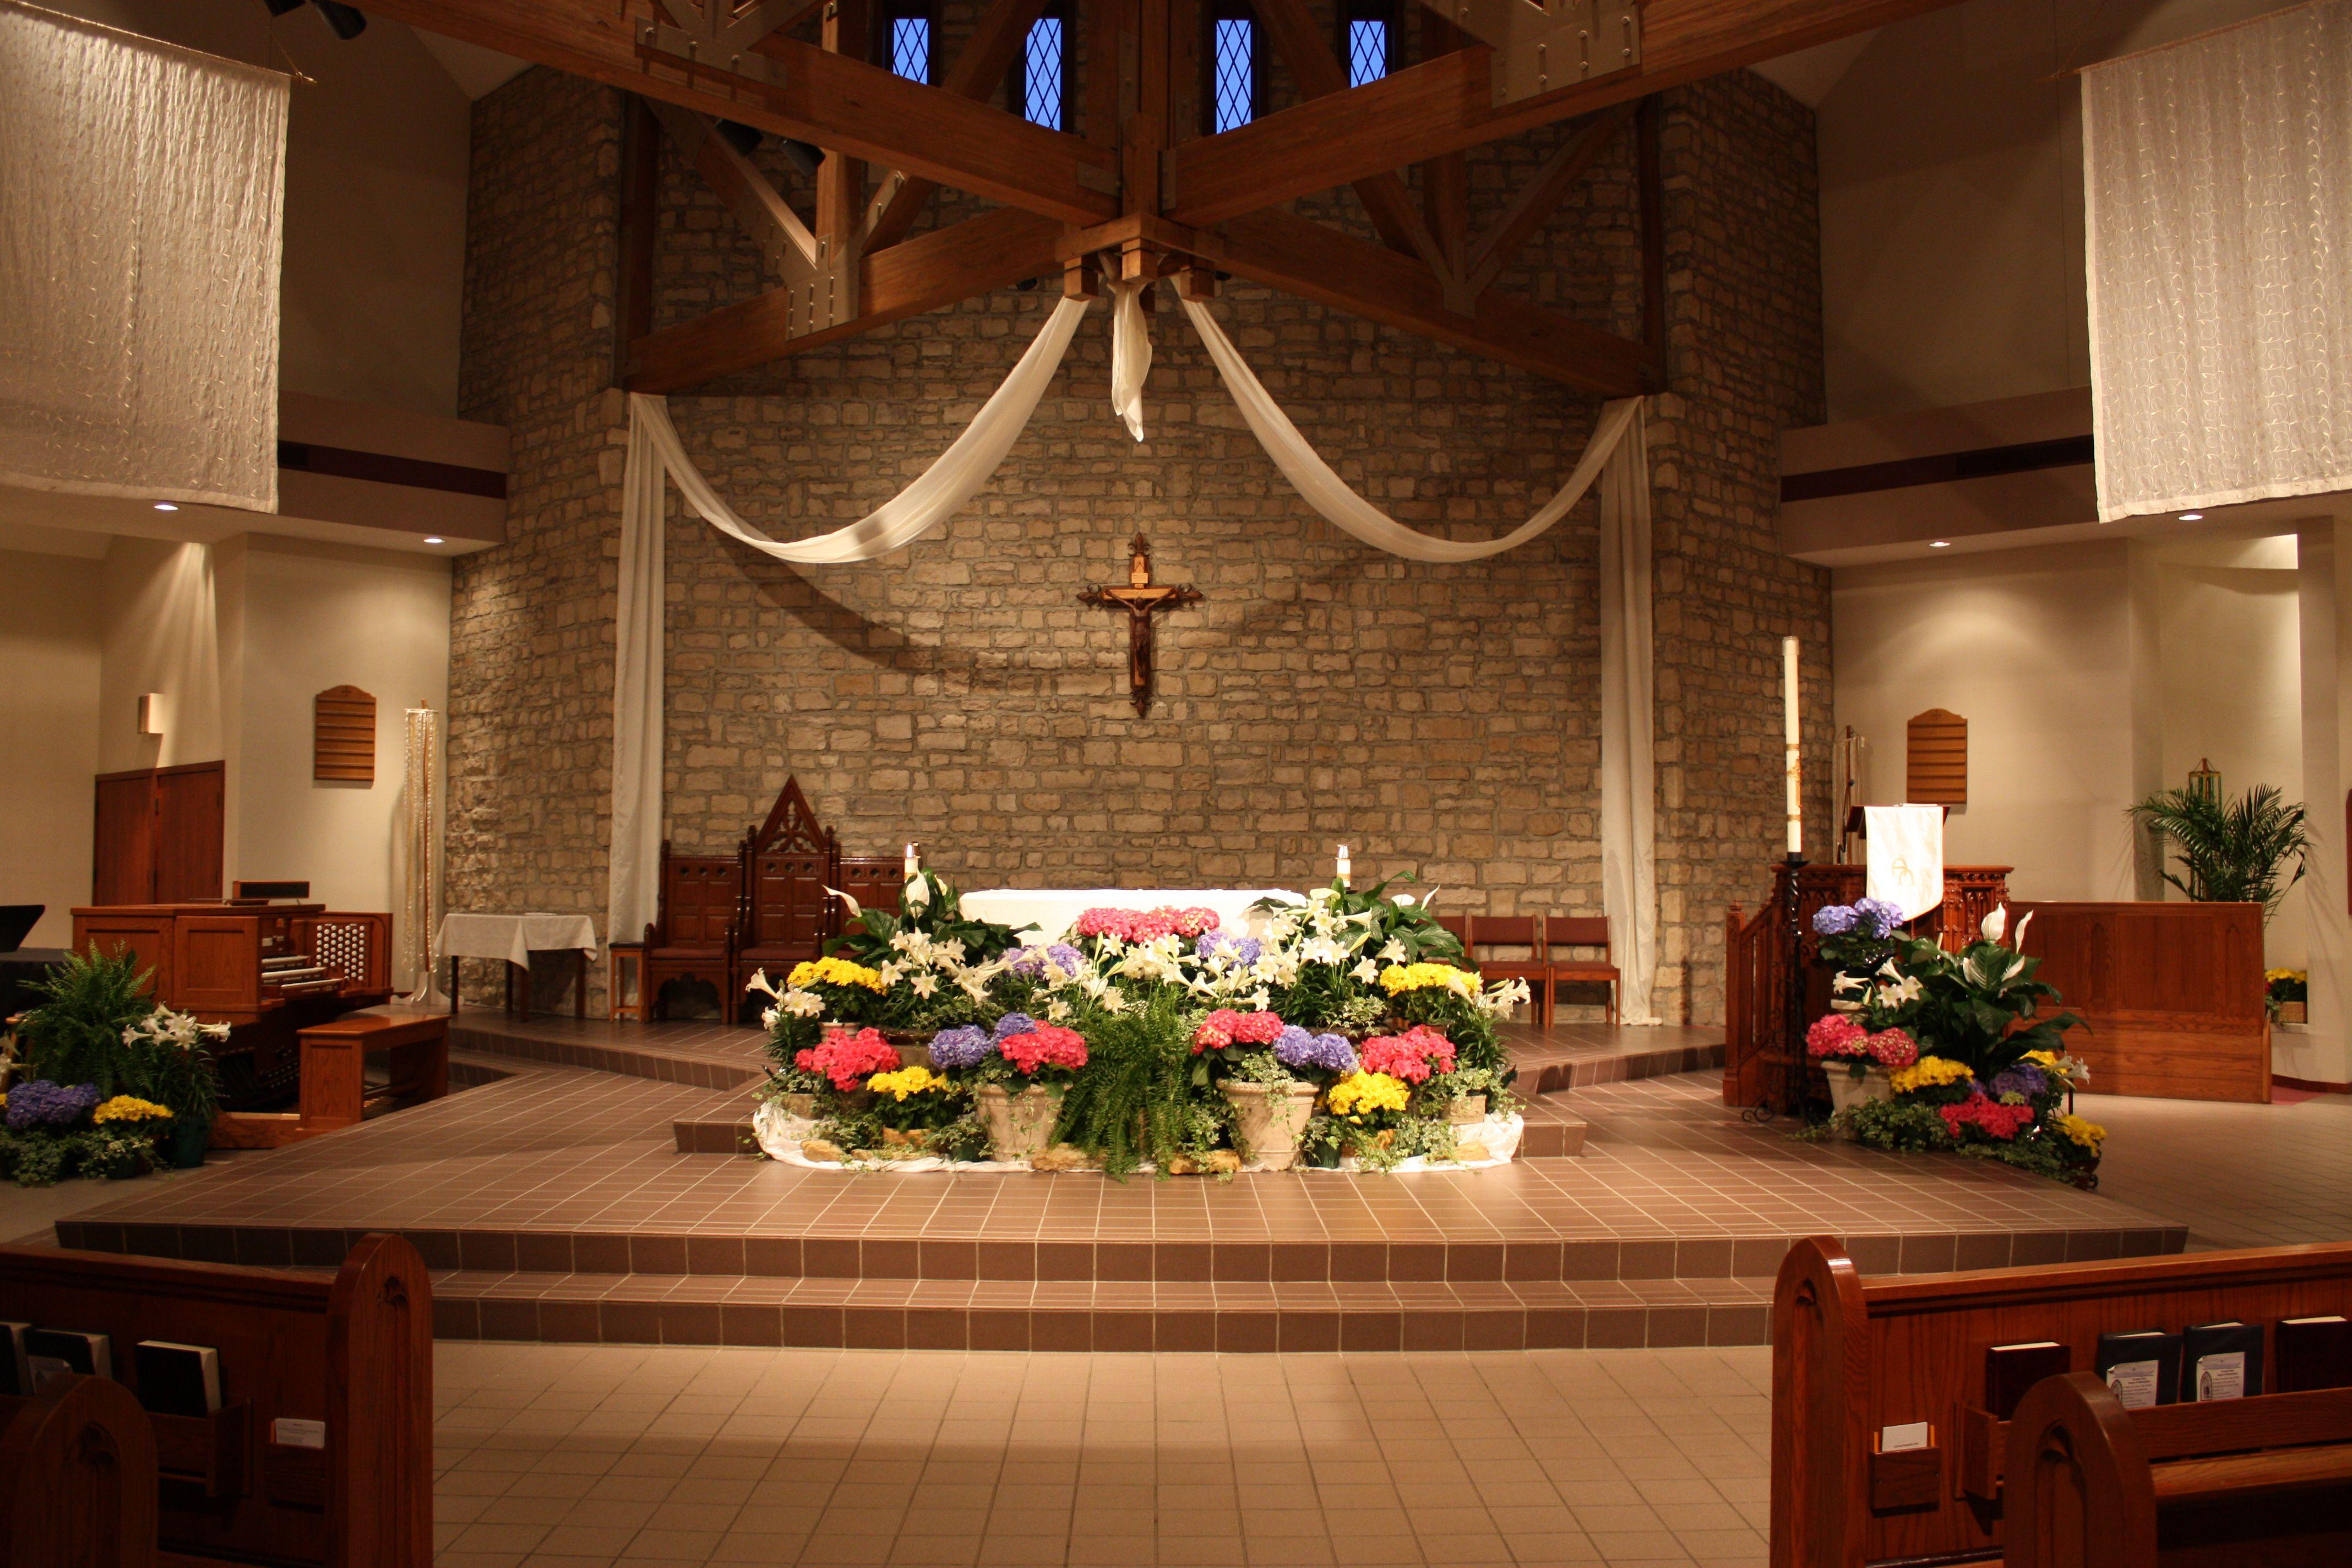 St joan of arc catholic church easter decorations